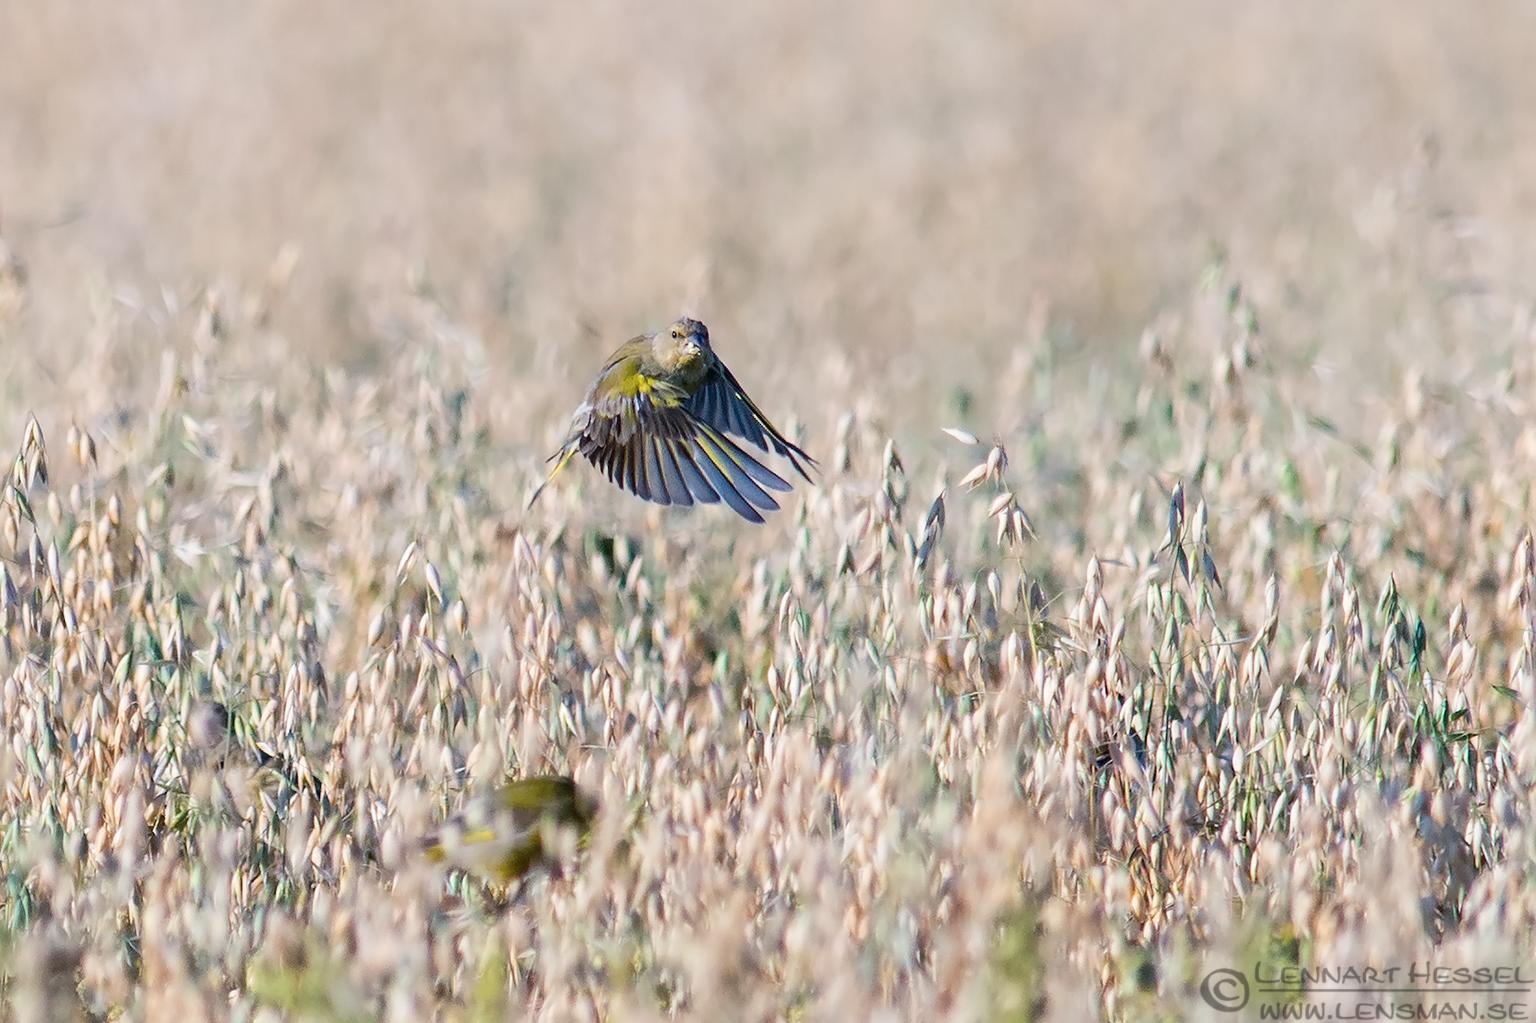 Greenfinch Öland 2012